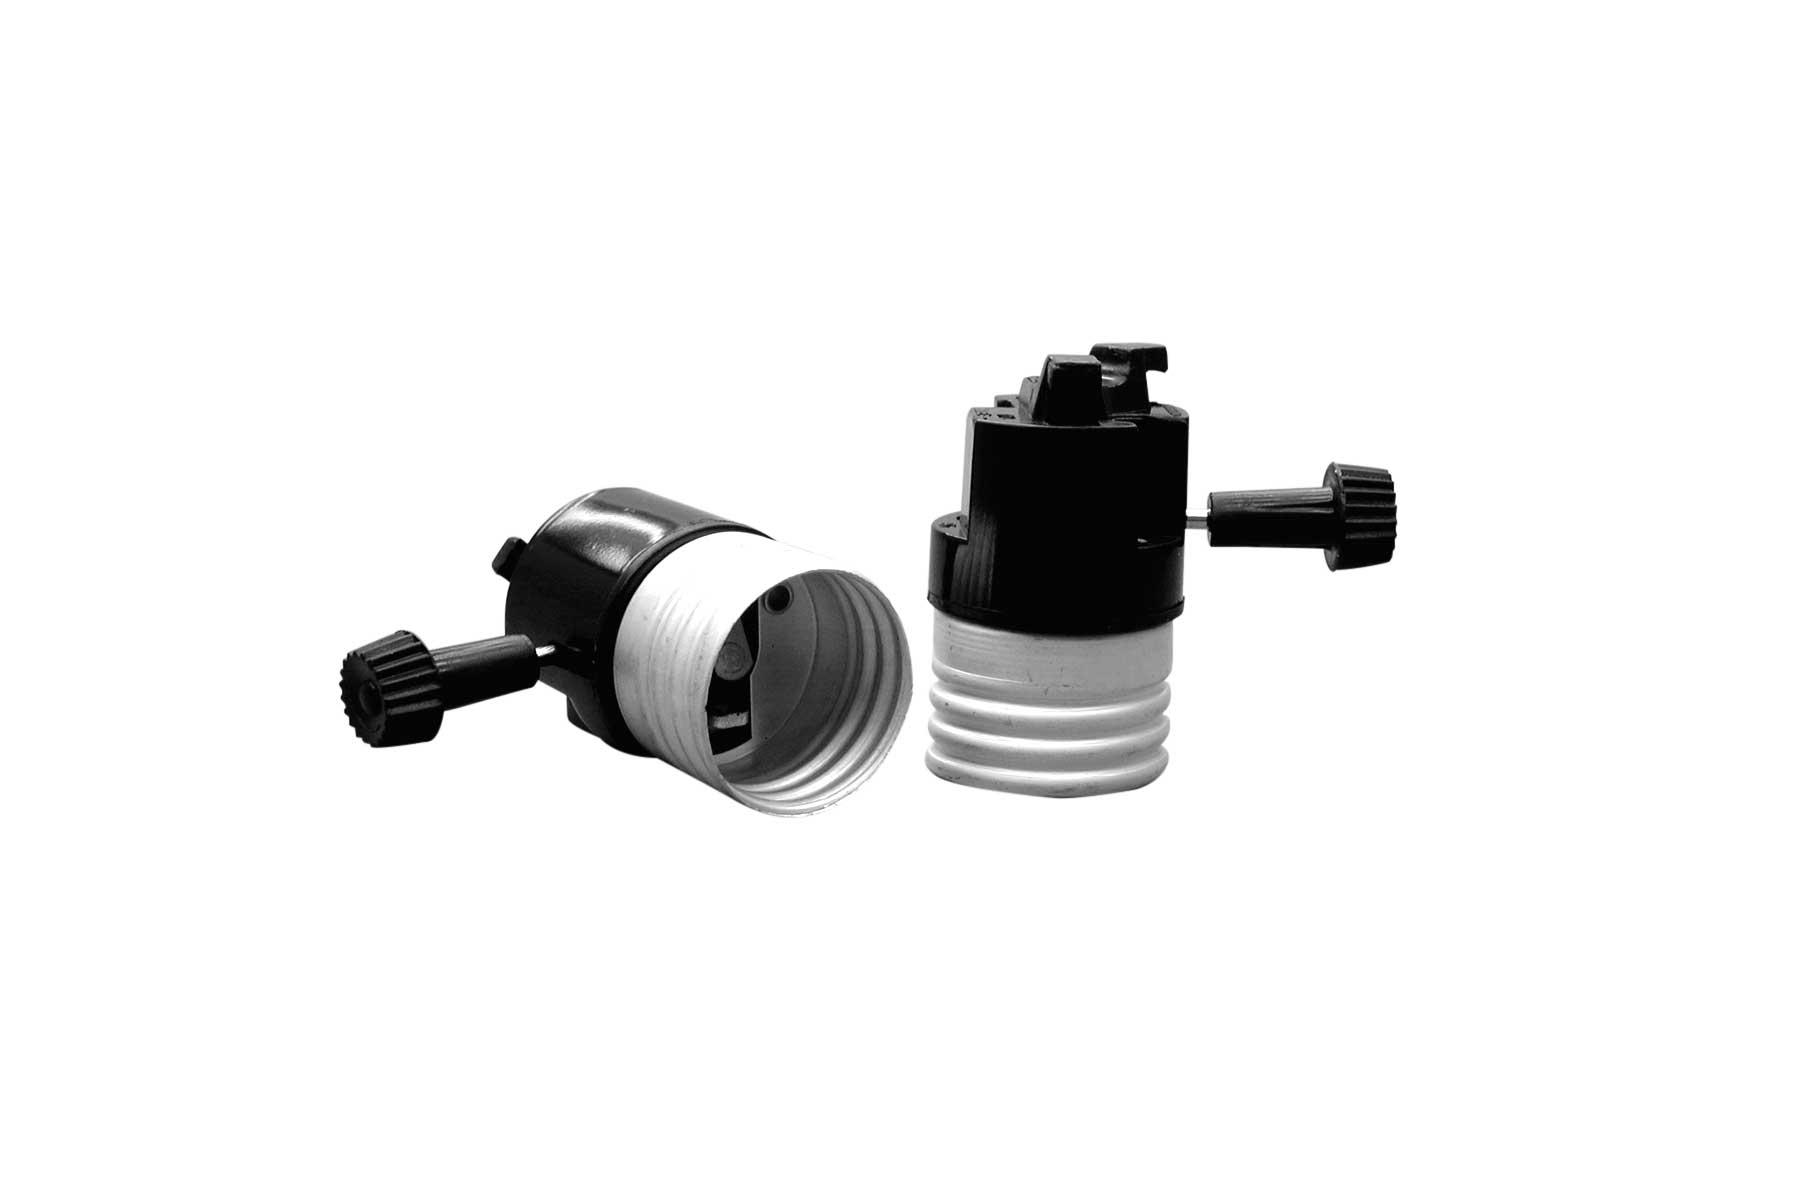 Turn Knob Electrolier for Medium Base Incandescent Light Socket Interior Mechanism